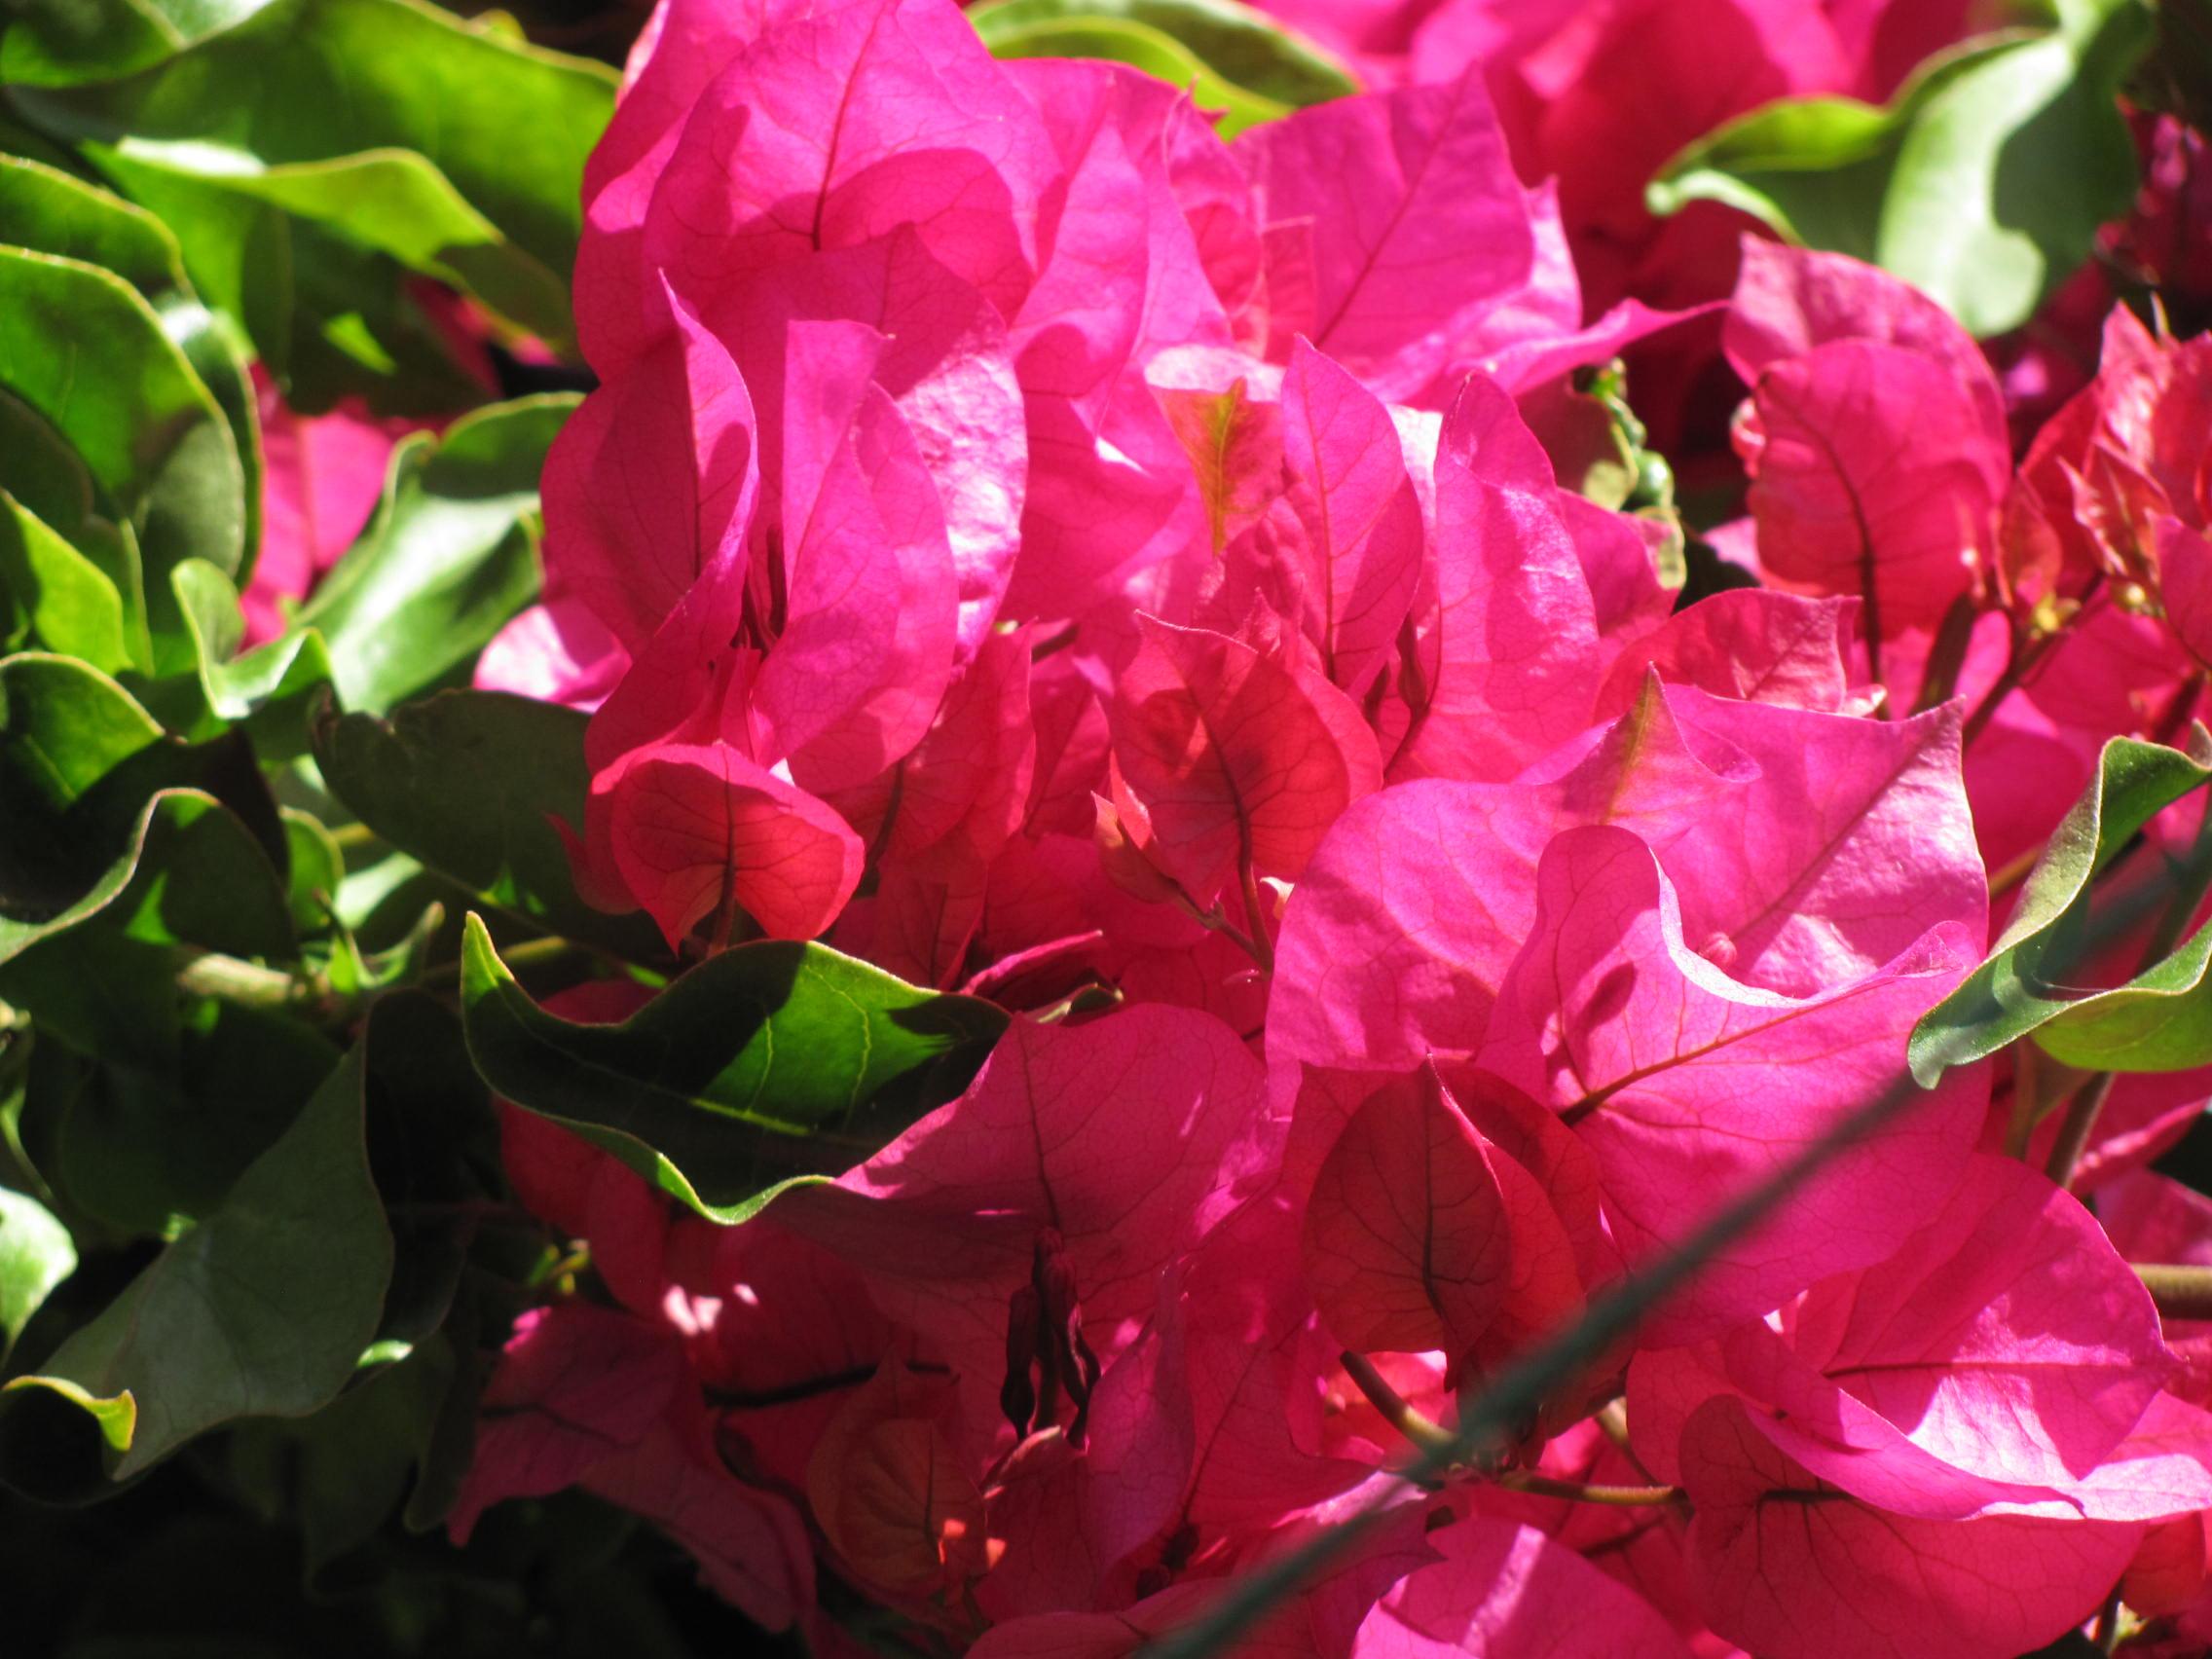 Ilanga khaya urlaub im sonnigen s dafrika kapstadt for Pflanzen laden berlin